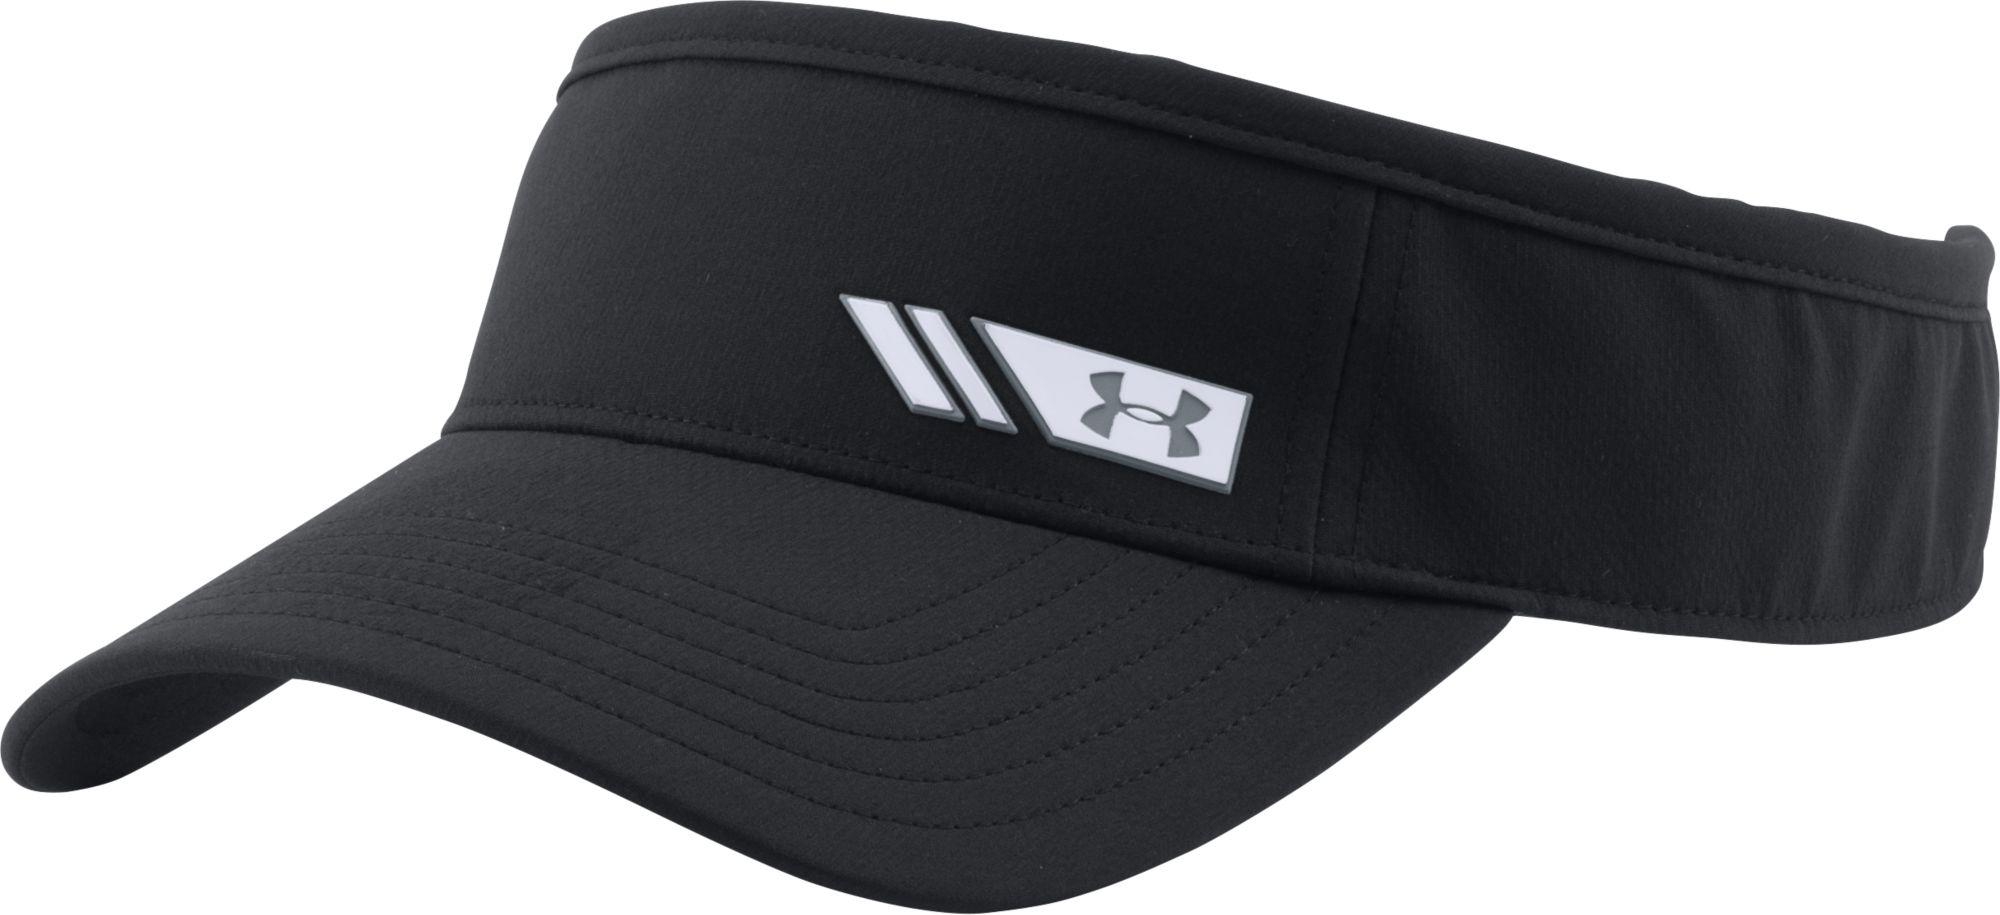 9a6bb98d862 Lyst - Under Armour Renegade Golf Visor in Black for Men